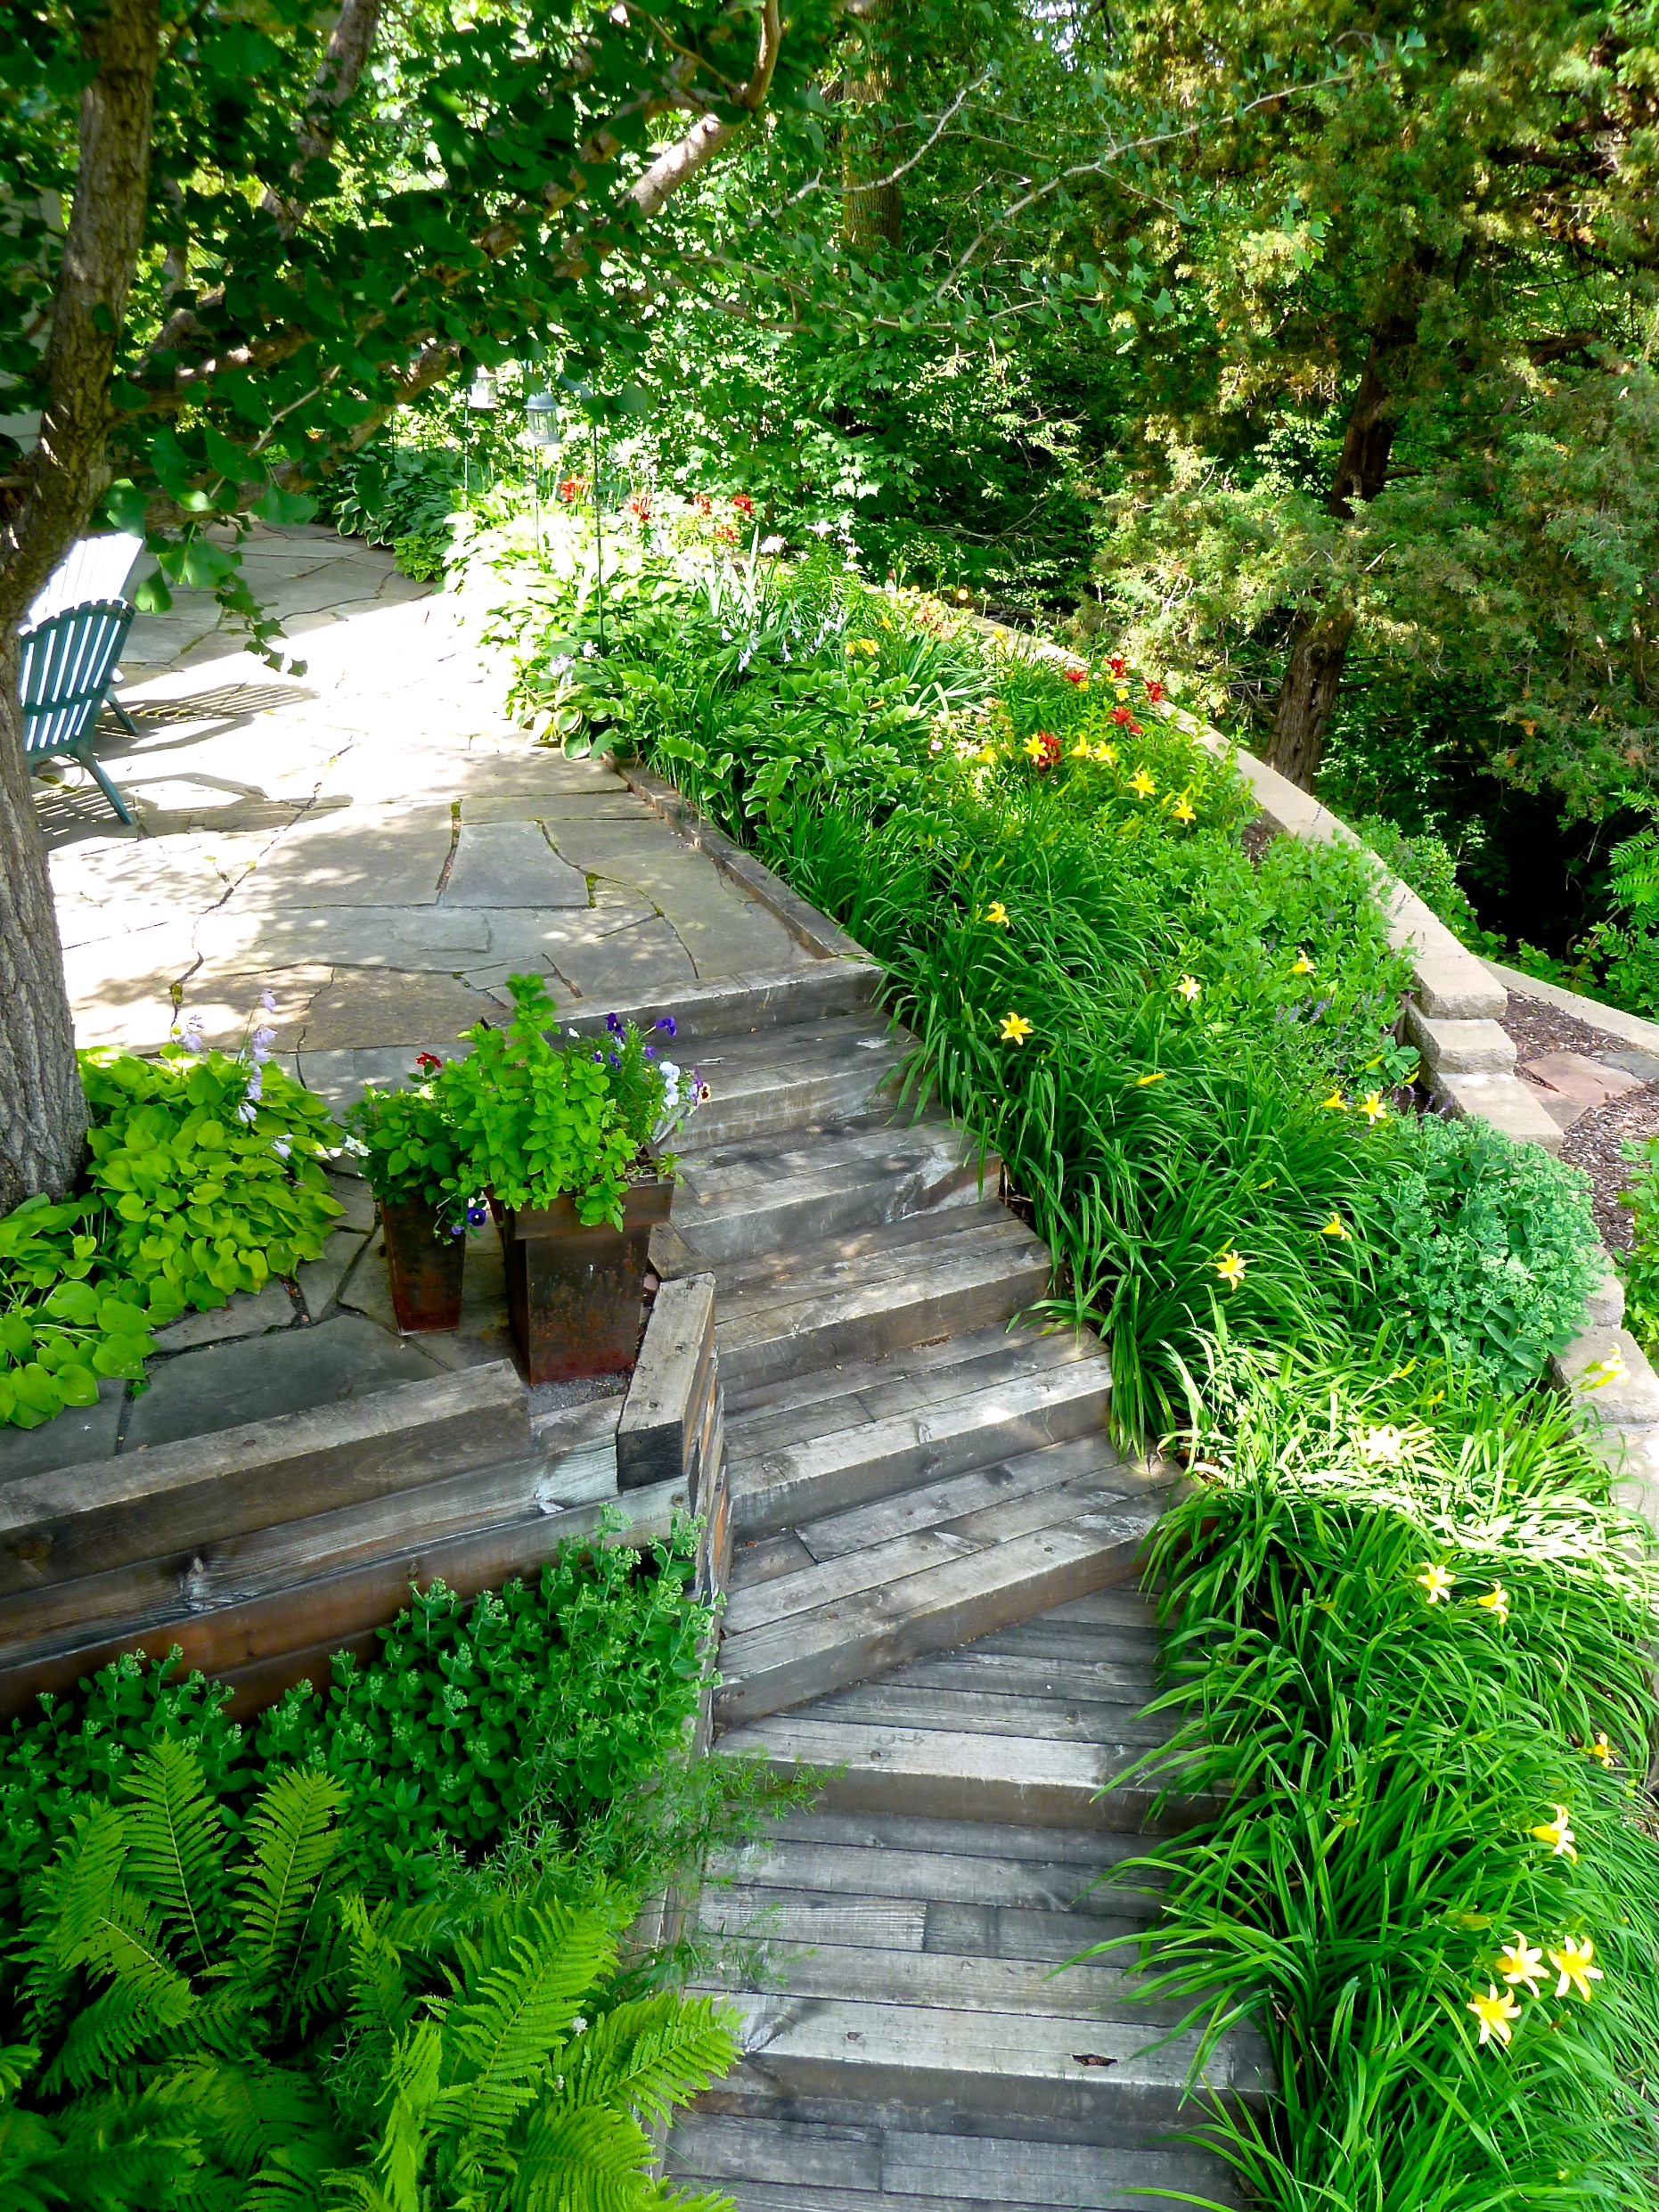 Stairway to a Heavenly Garden